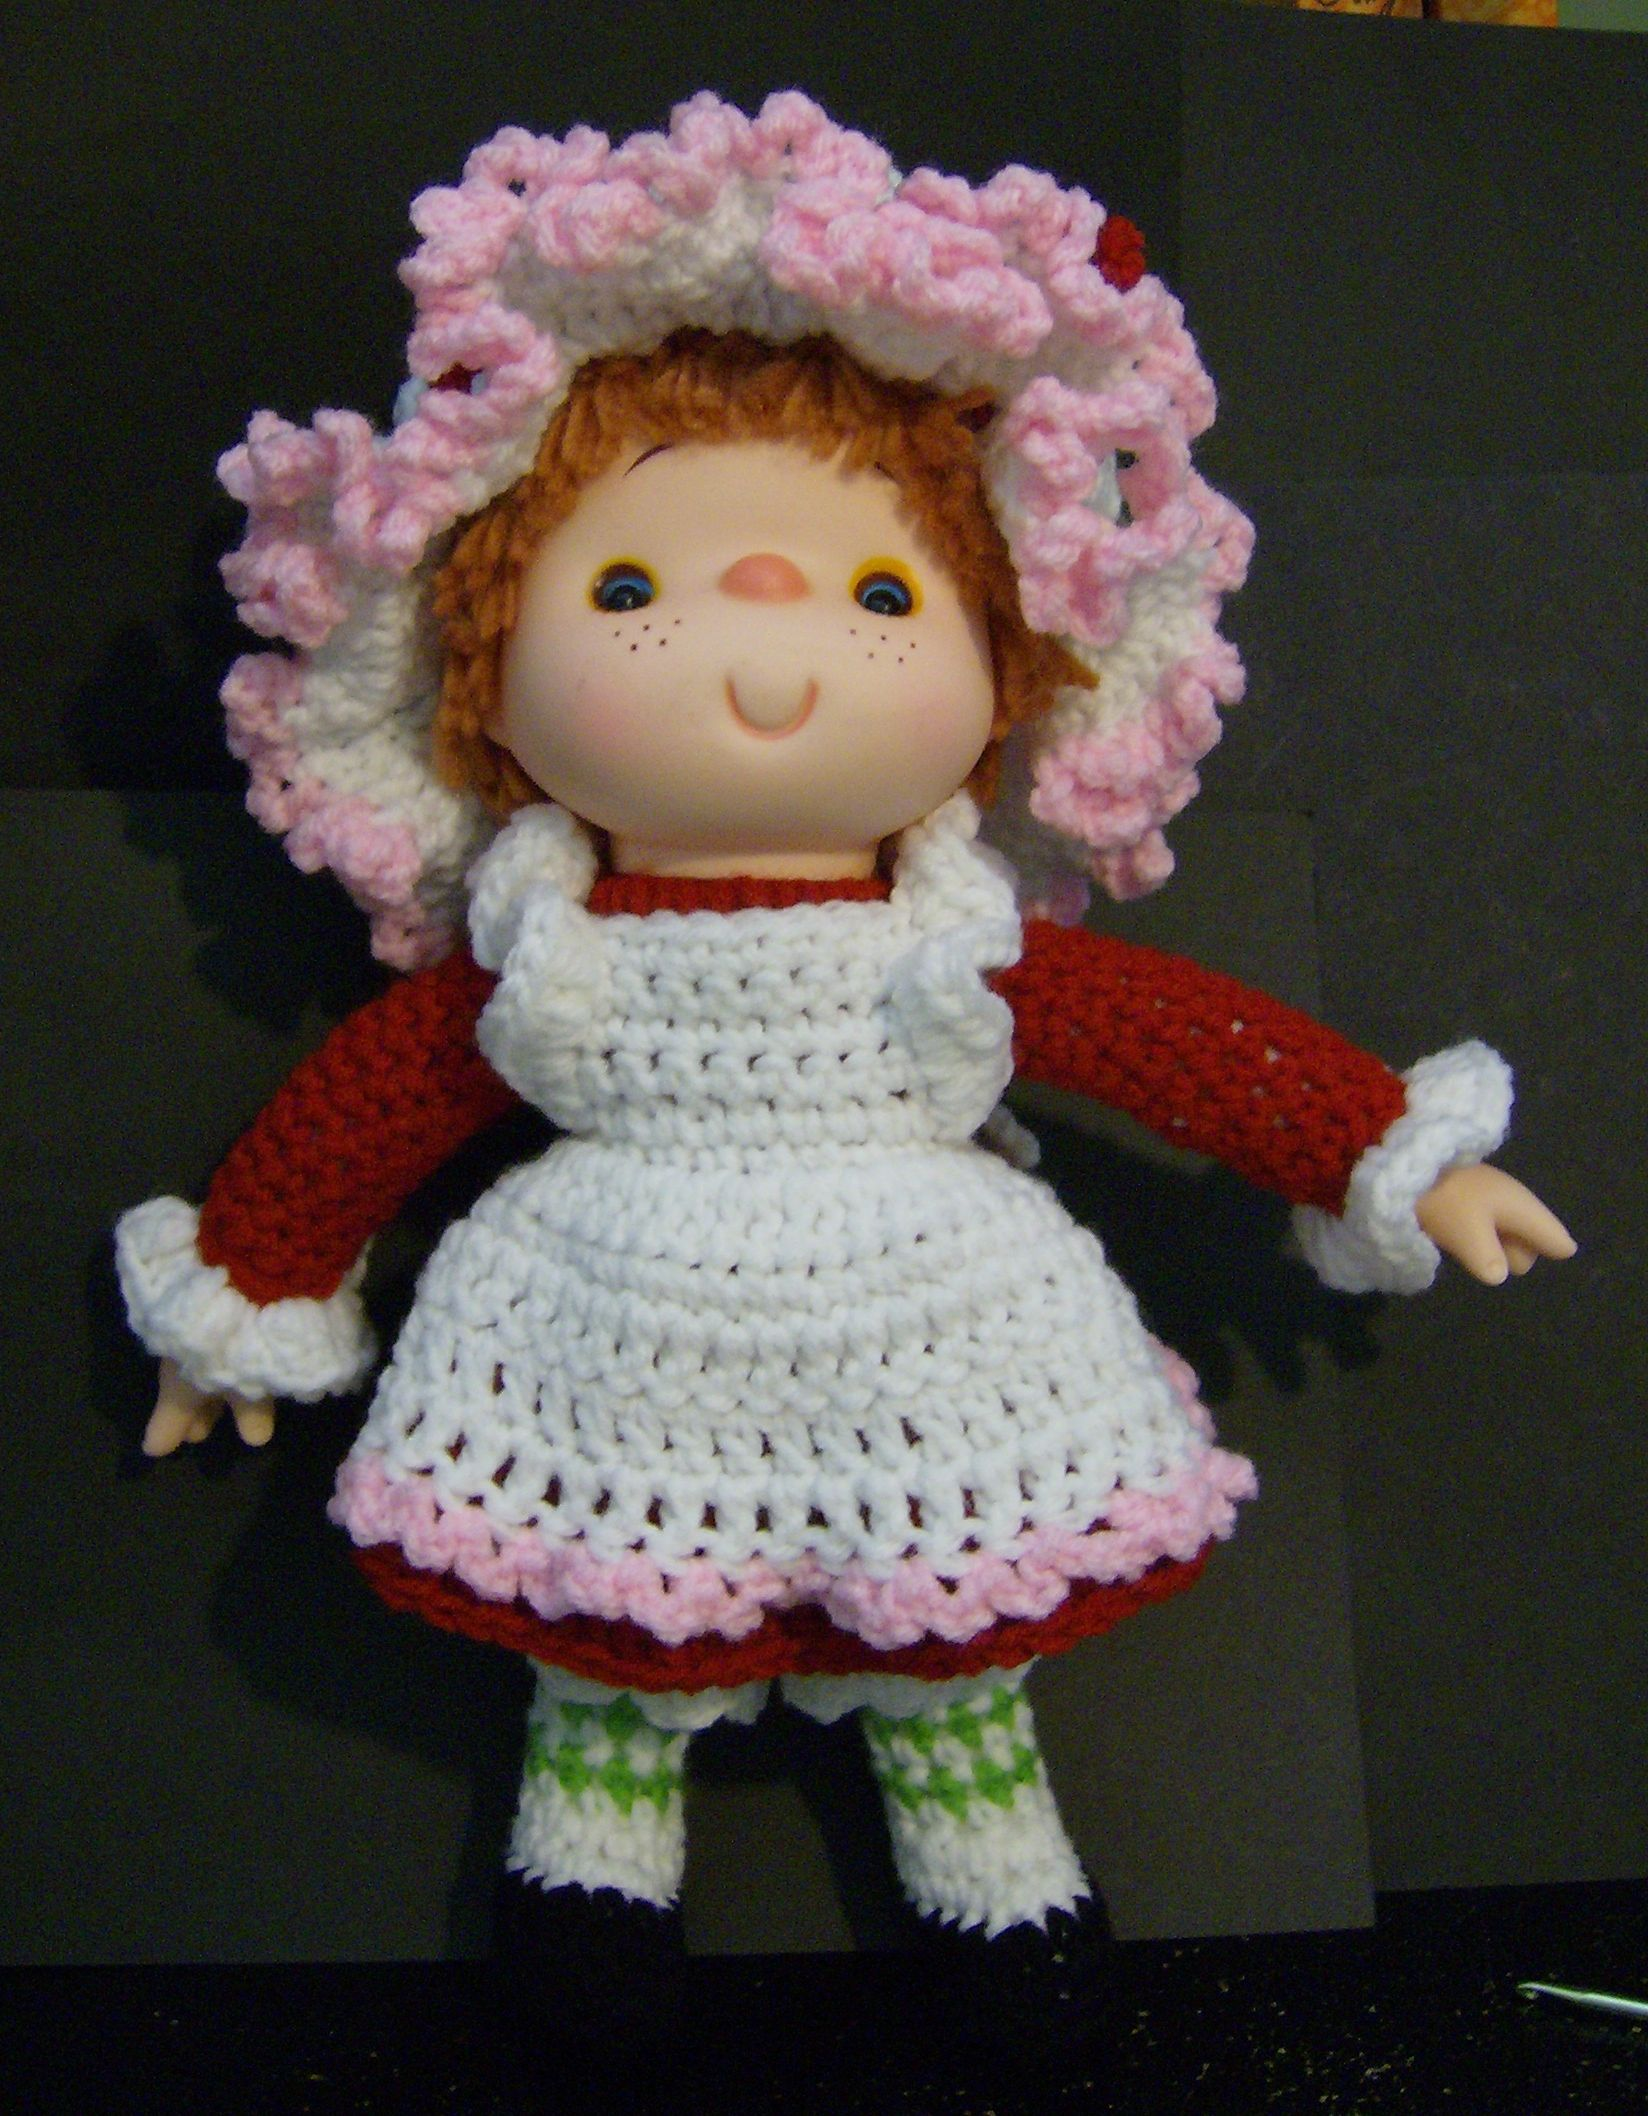 Strawberry Shortcake Crochet Doll | Ideas Bonitas | Pinterest ...